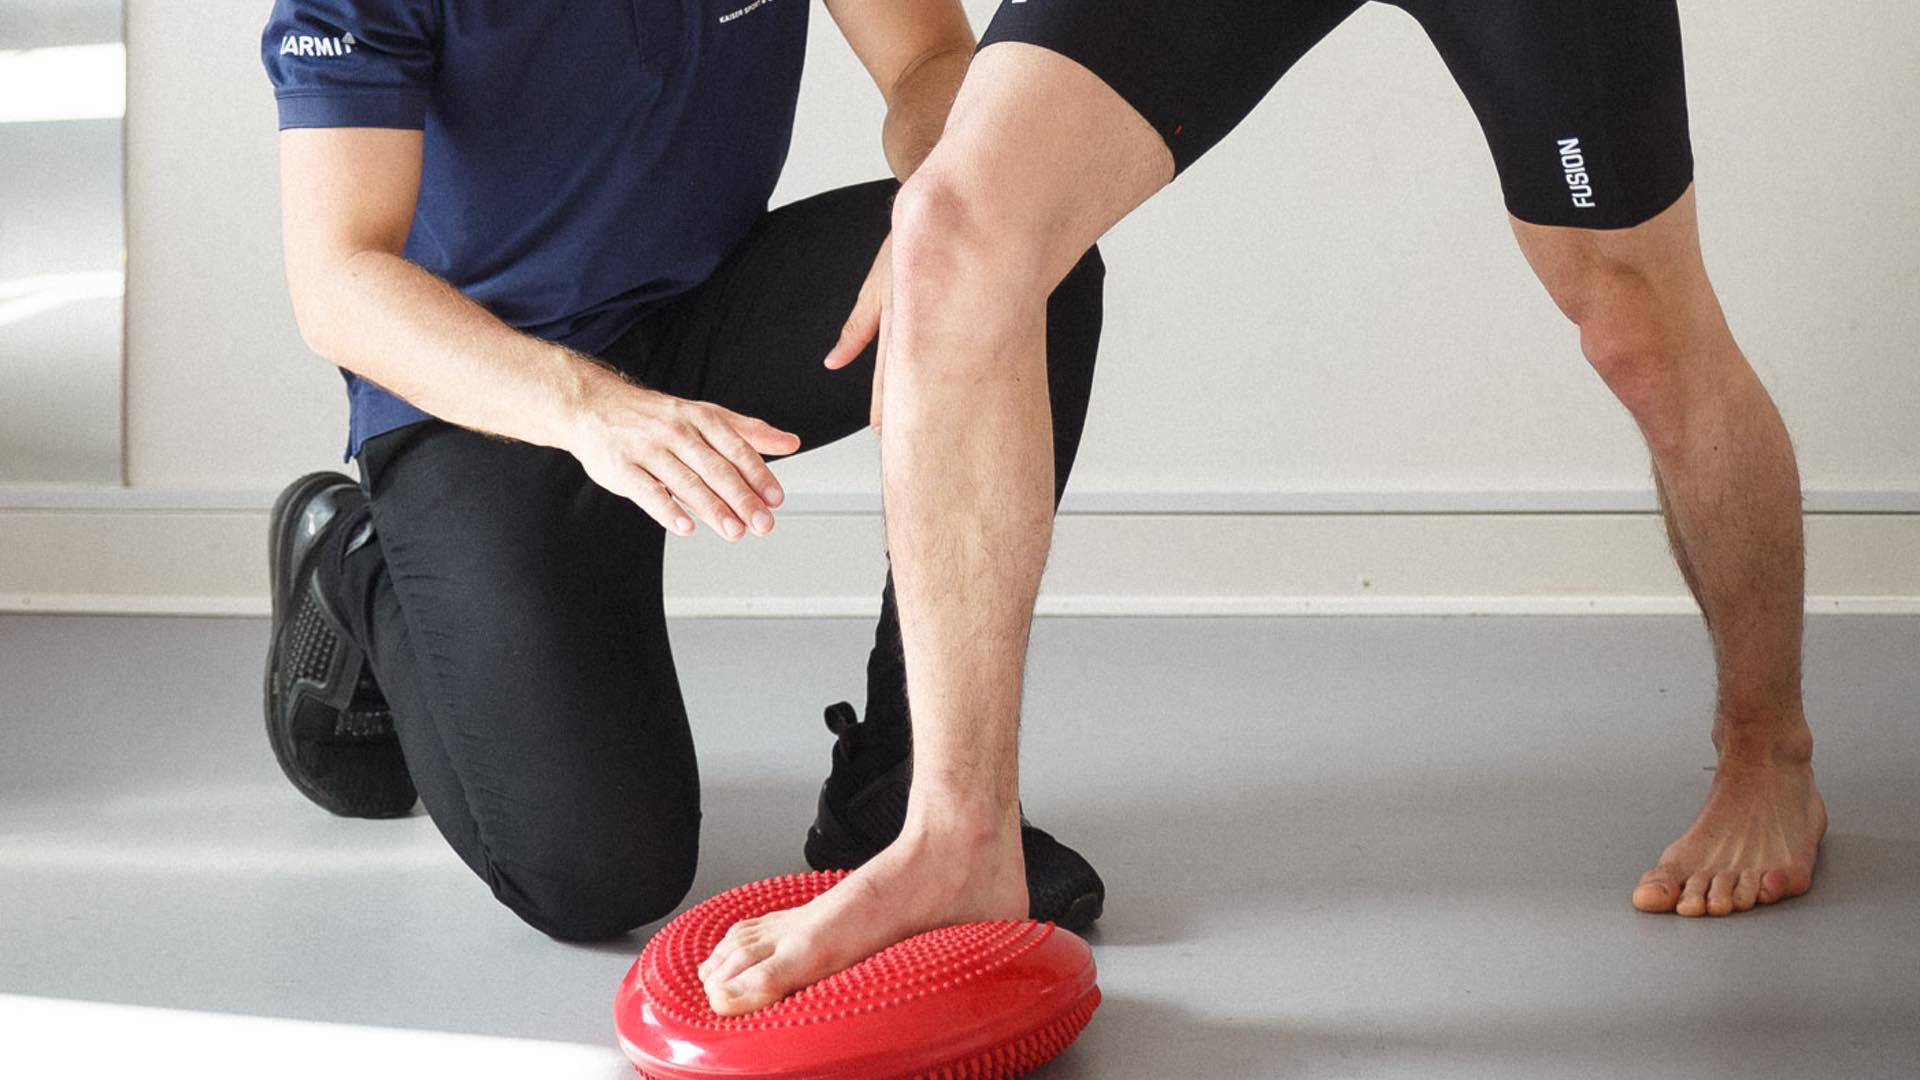 Forfodsfald, nedsunken forfod, ondt i forfoden under trædepuden, behandling